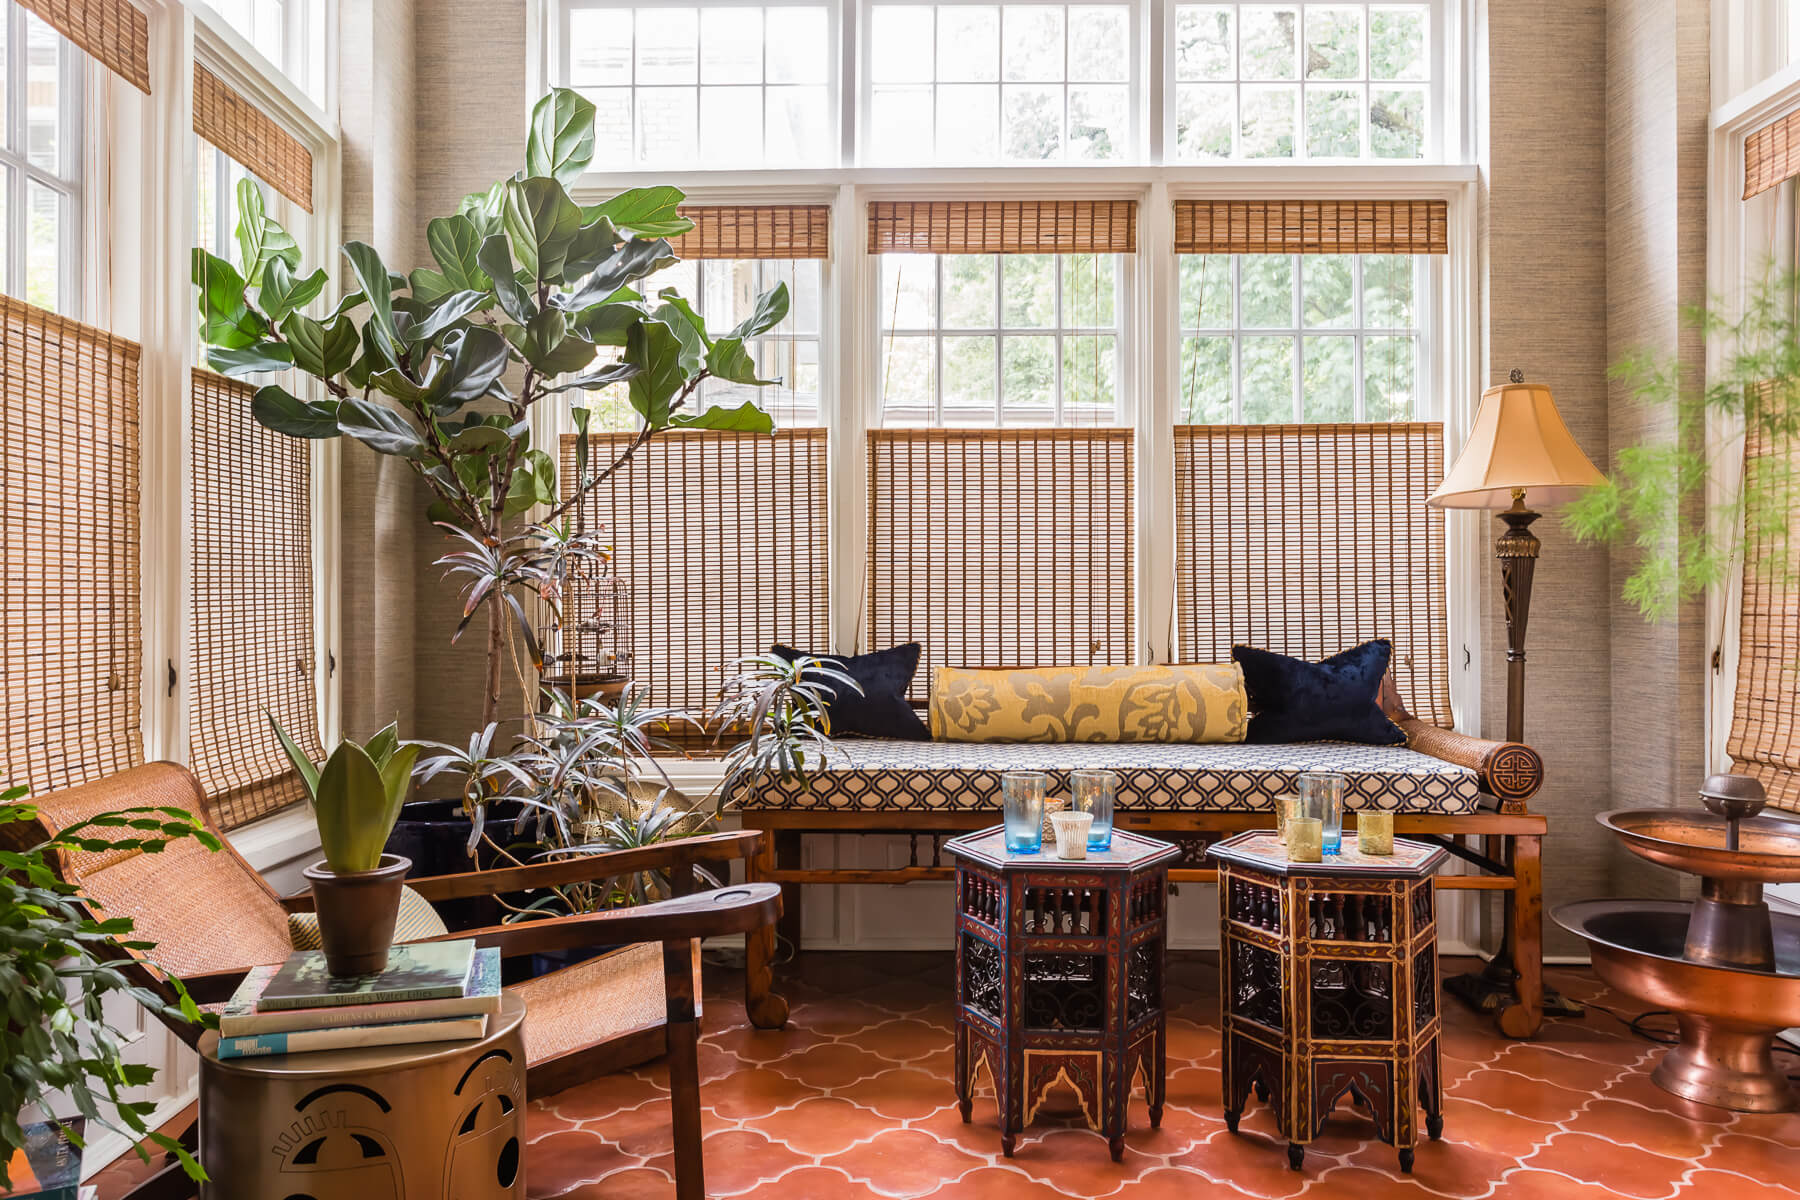 Spanish Sunroom Terracotta Floors Fiddle Leaf Fig Asian Daybed